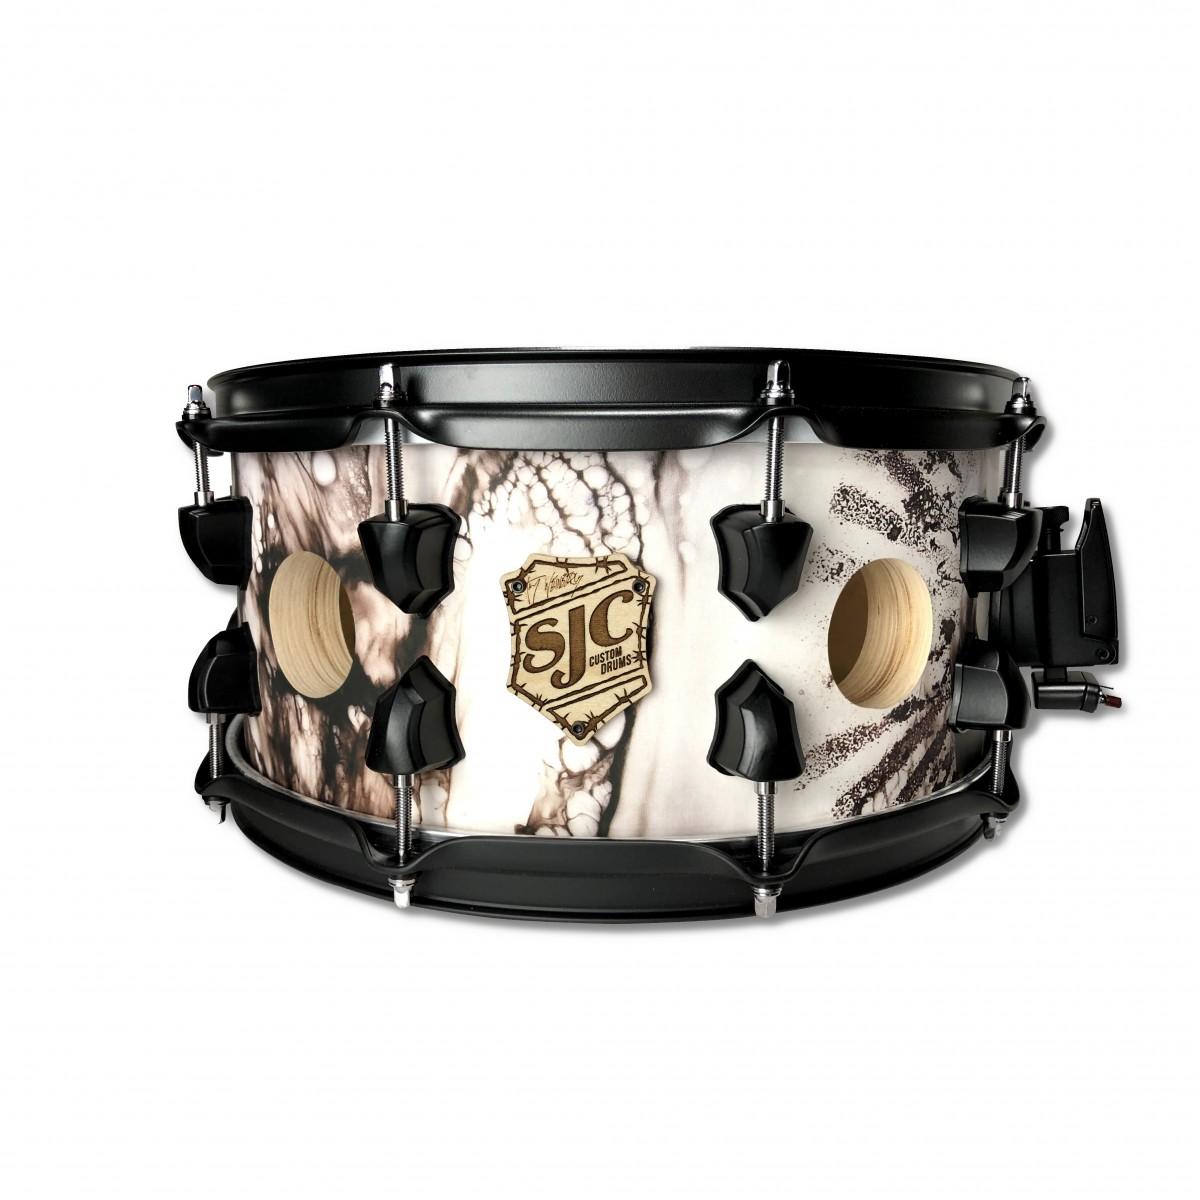 SJC Jay Weinberg 14 x 6.5 Signature Snare Drum